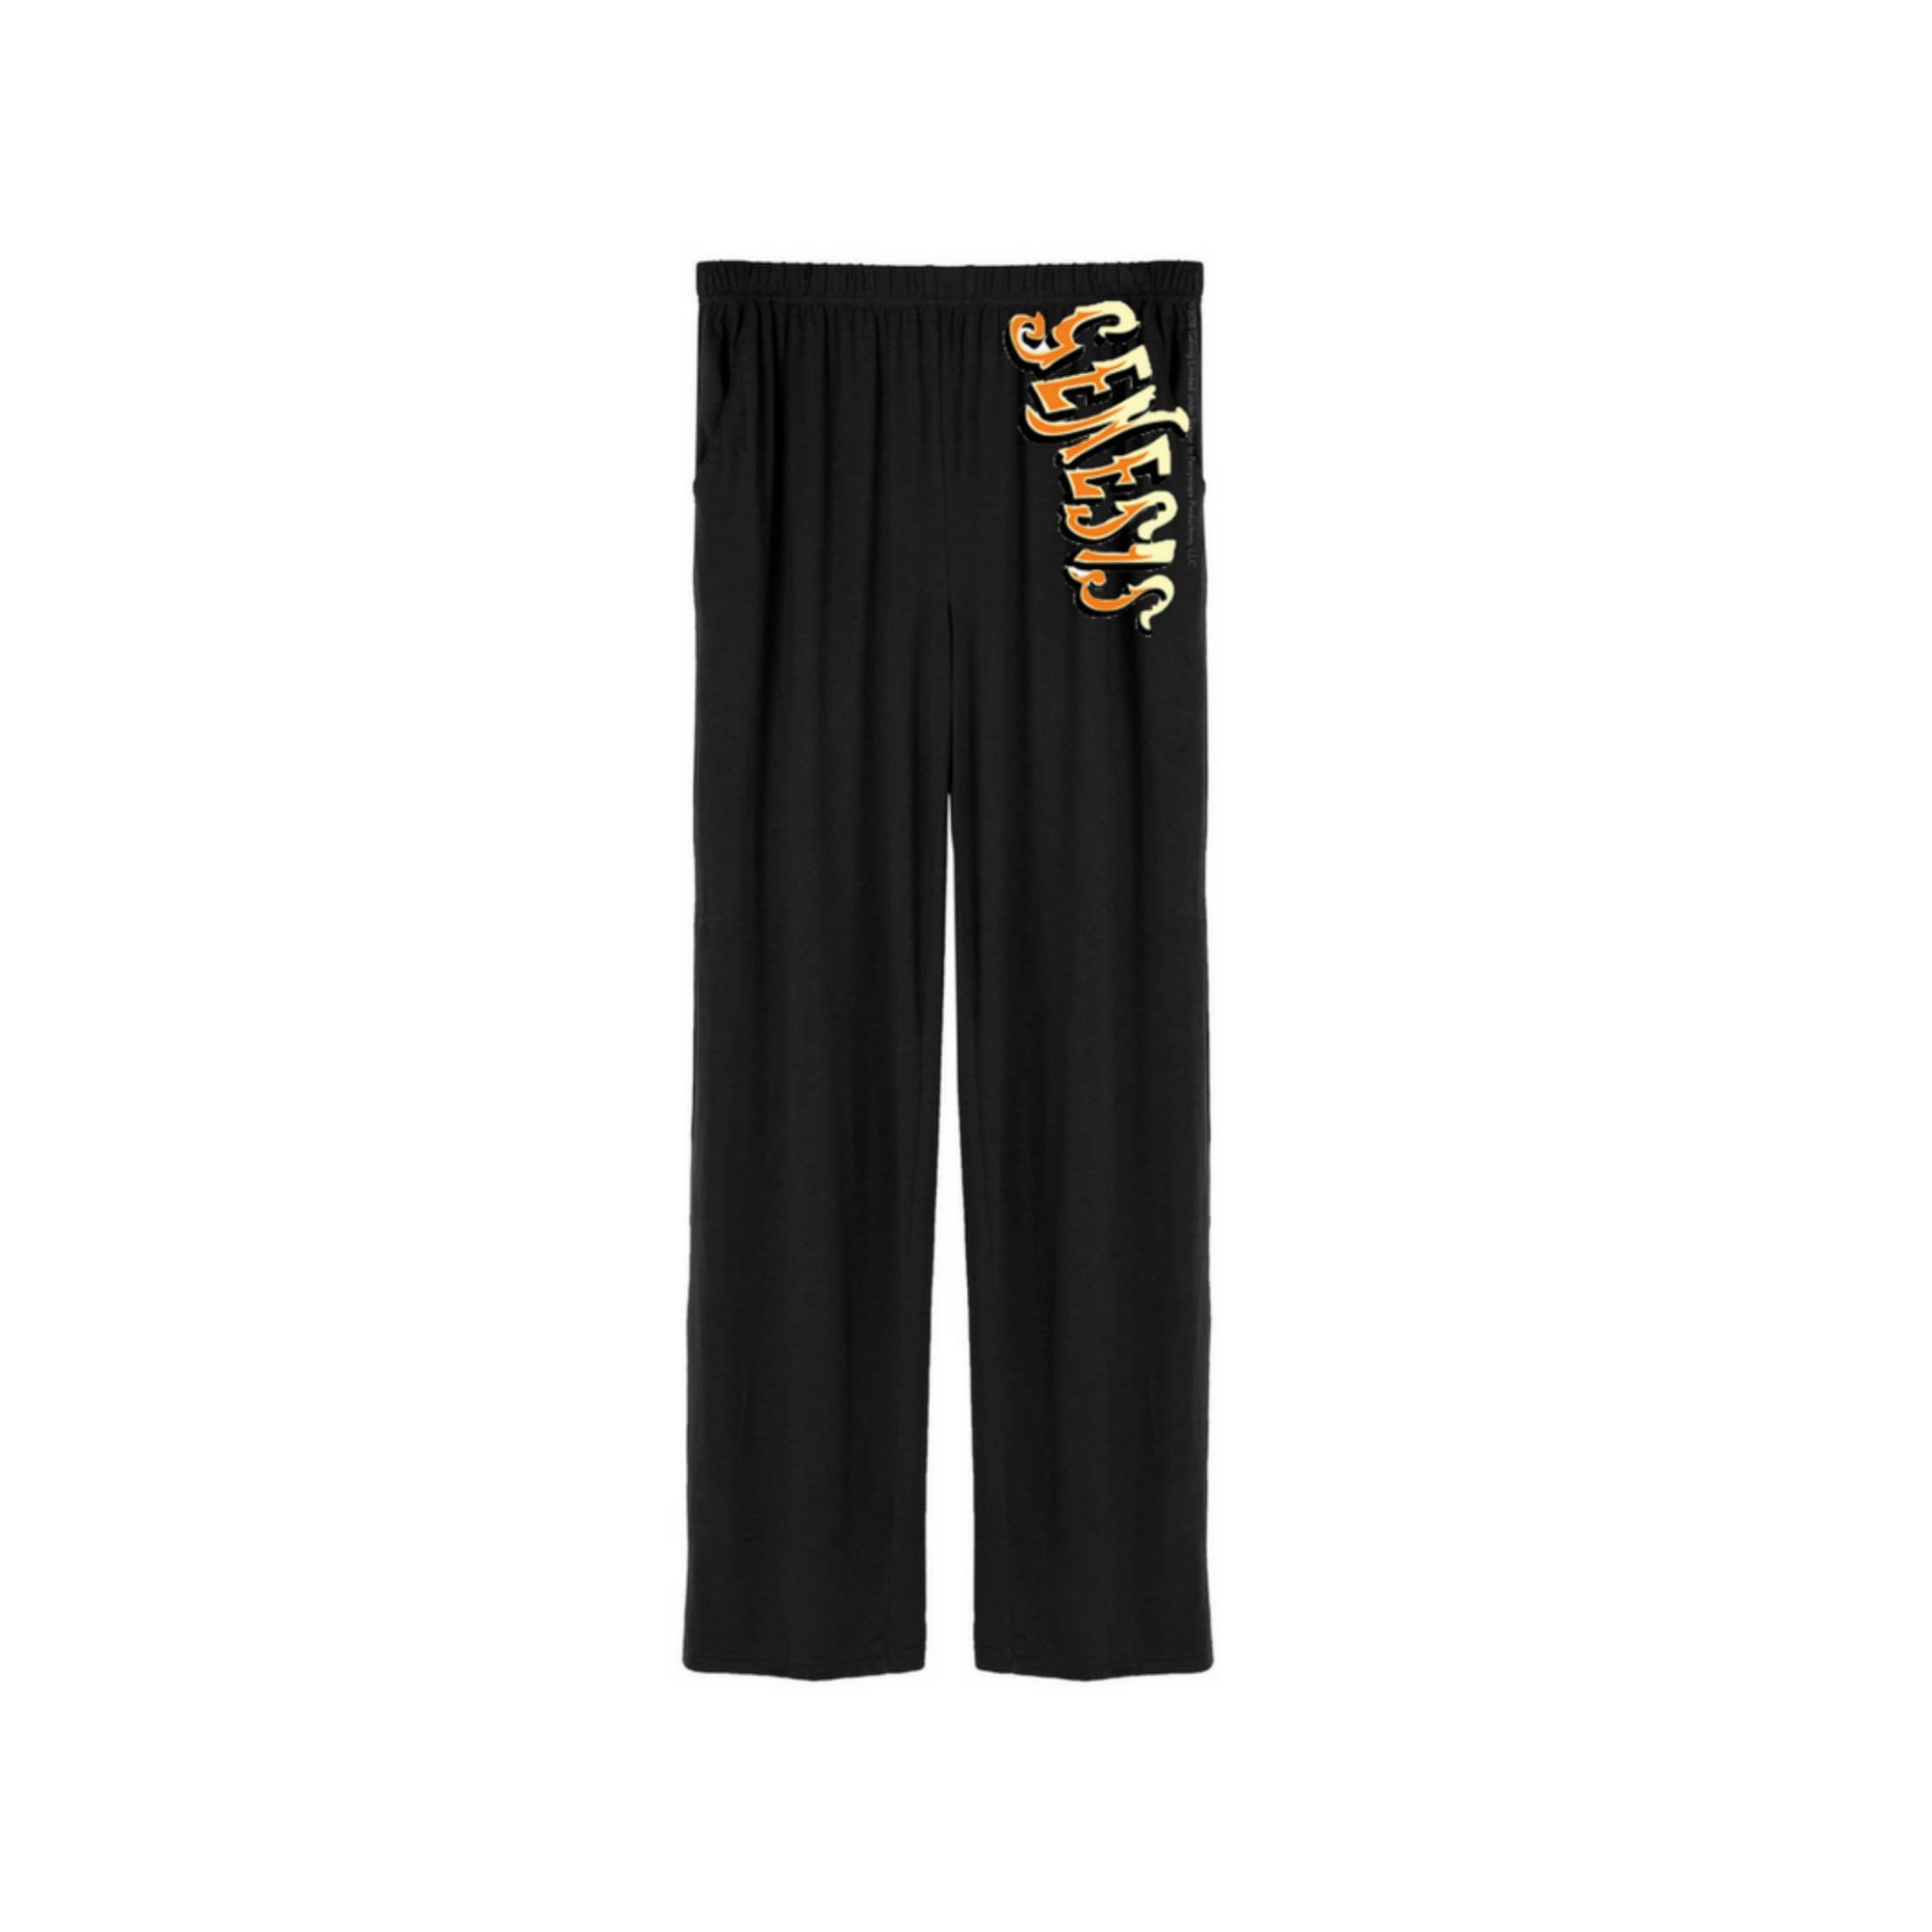 Two Tone Logo Pajama Pants